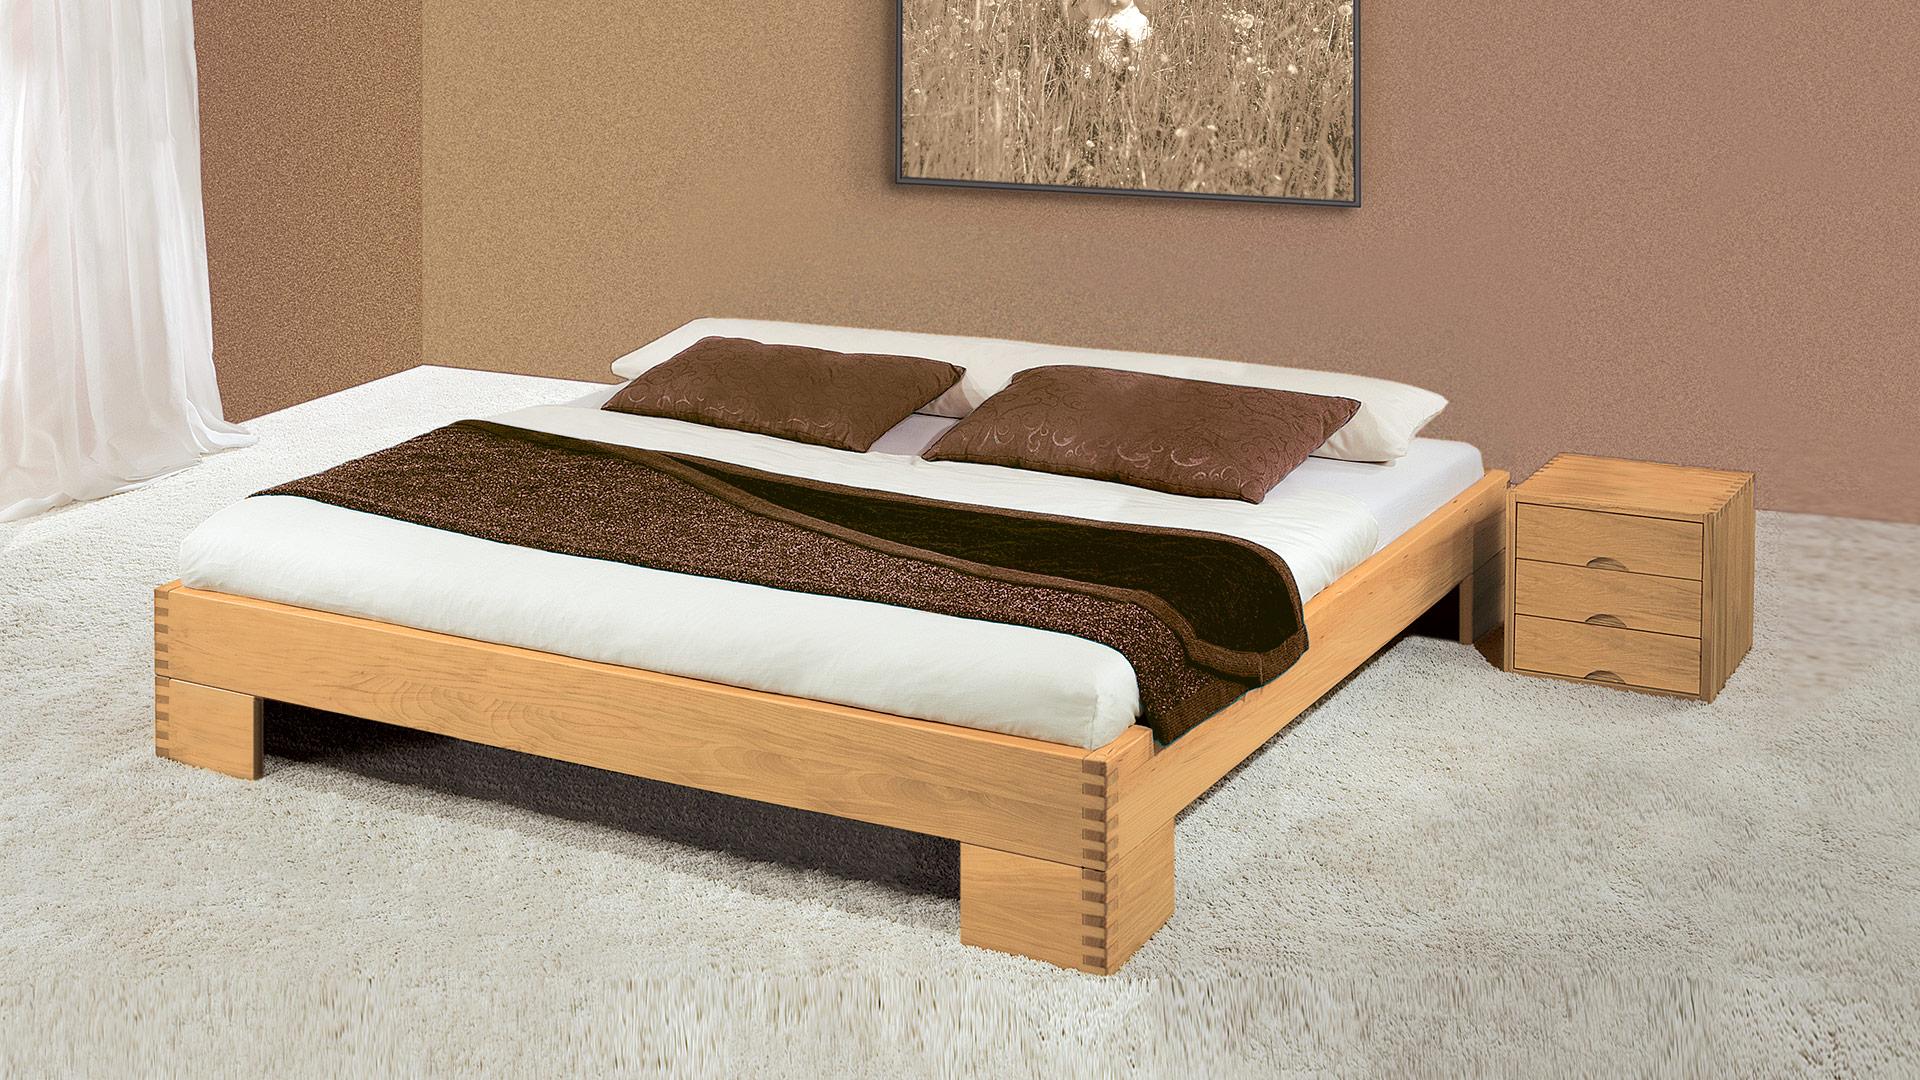 Allnatura Betten einzelbett und doppelbett liege allnatura de